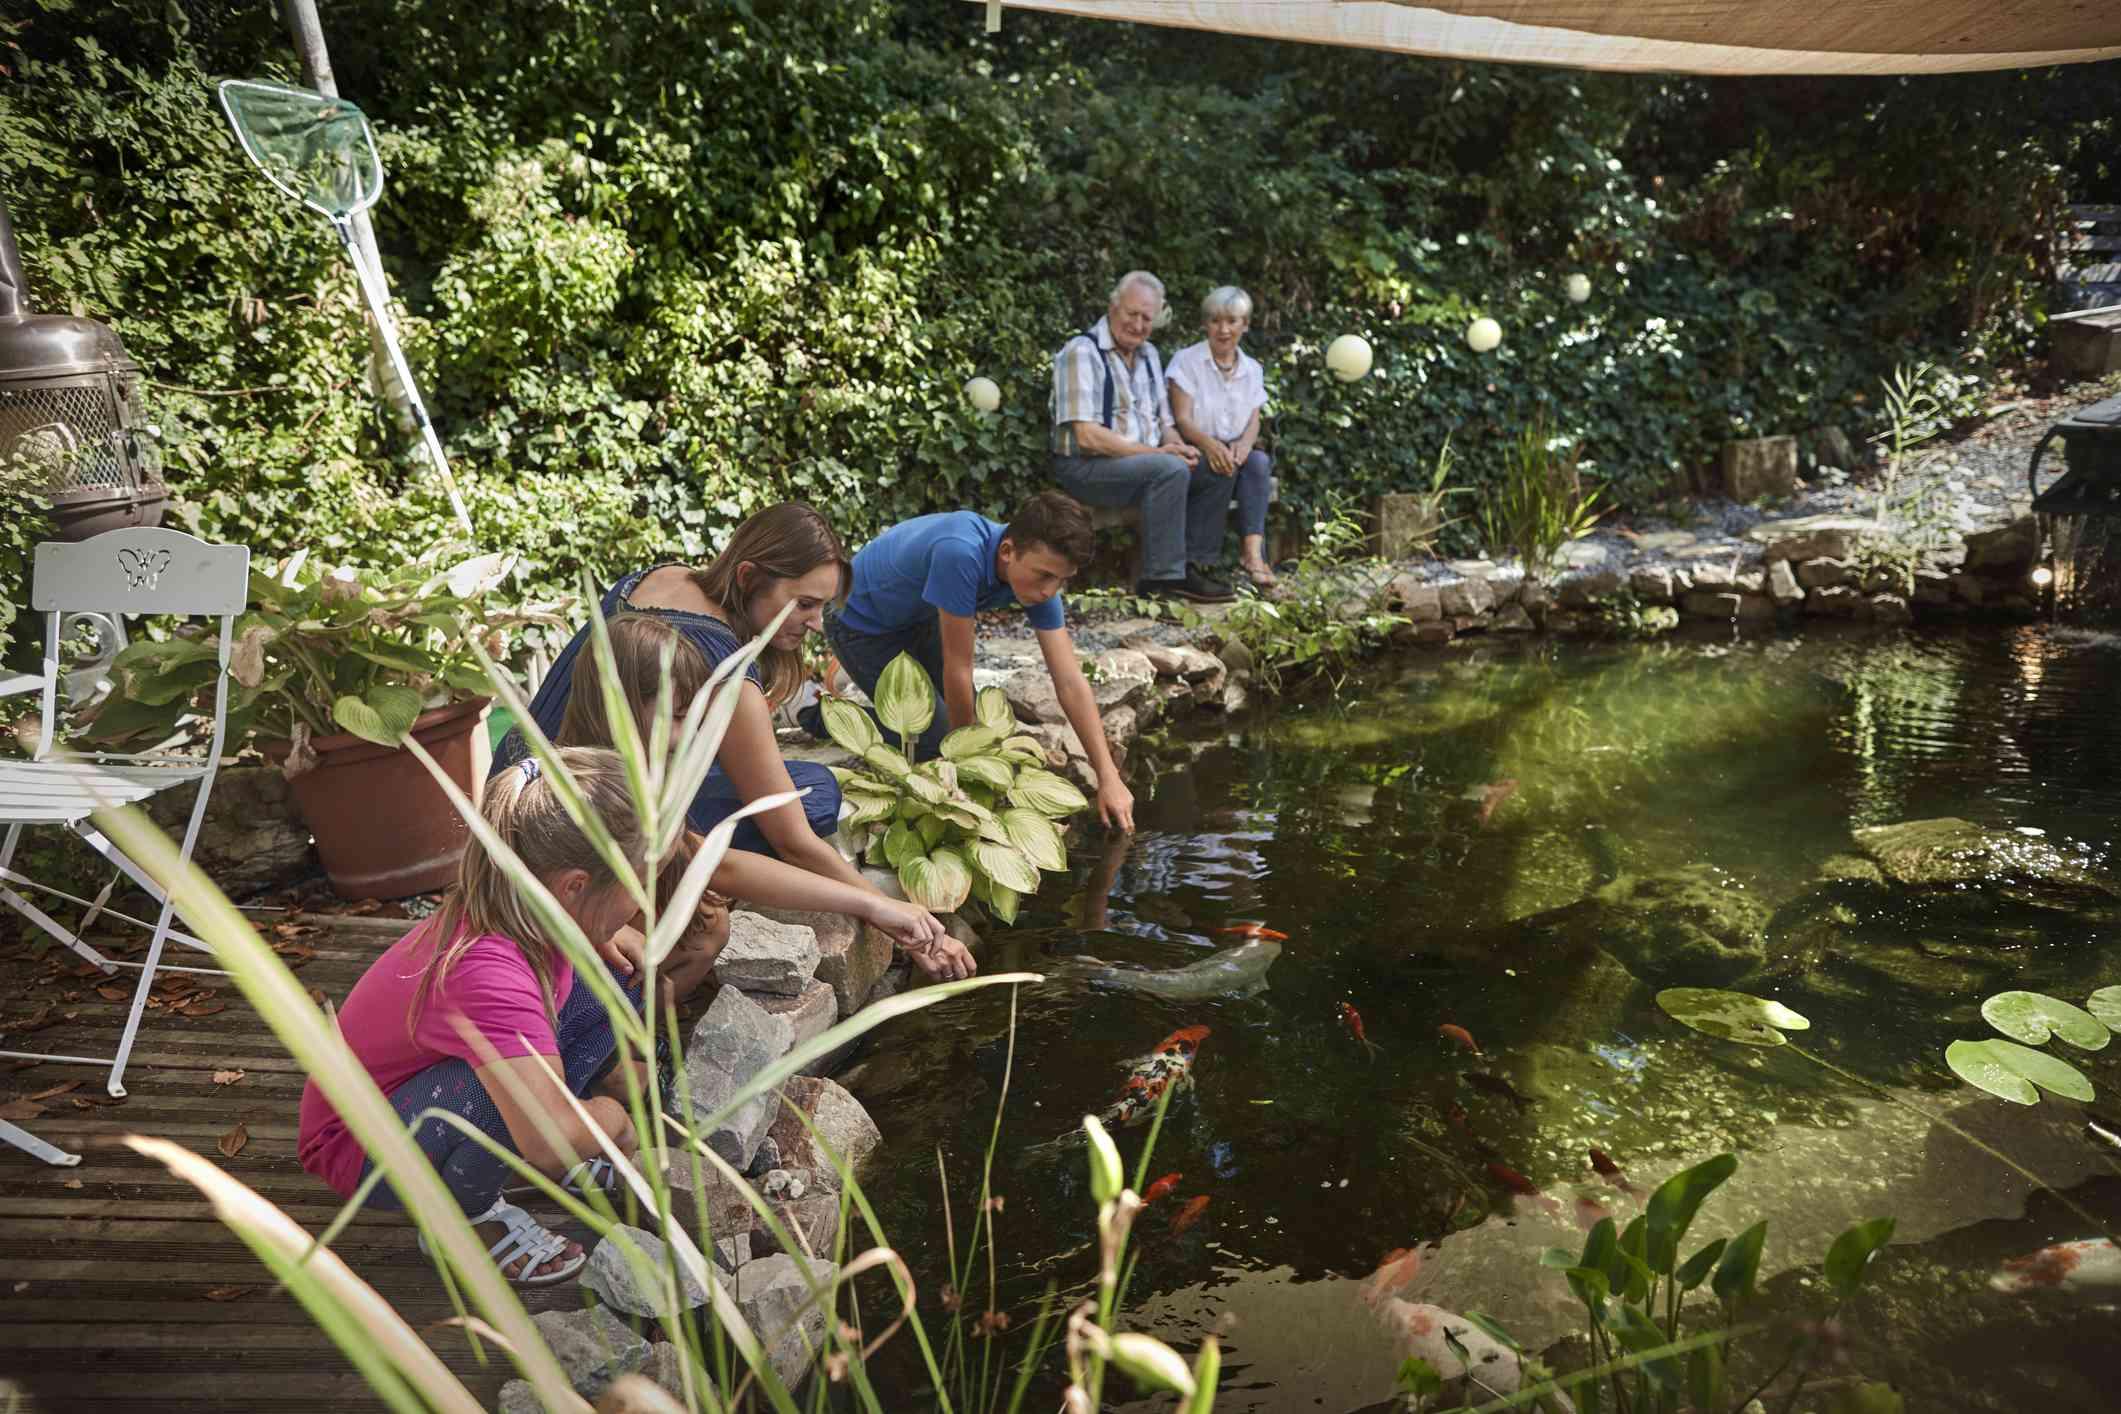 A family feeding and watching koi fish.